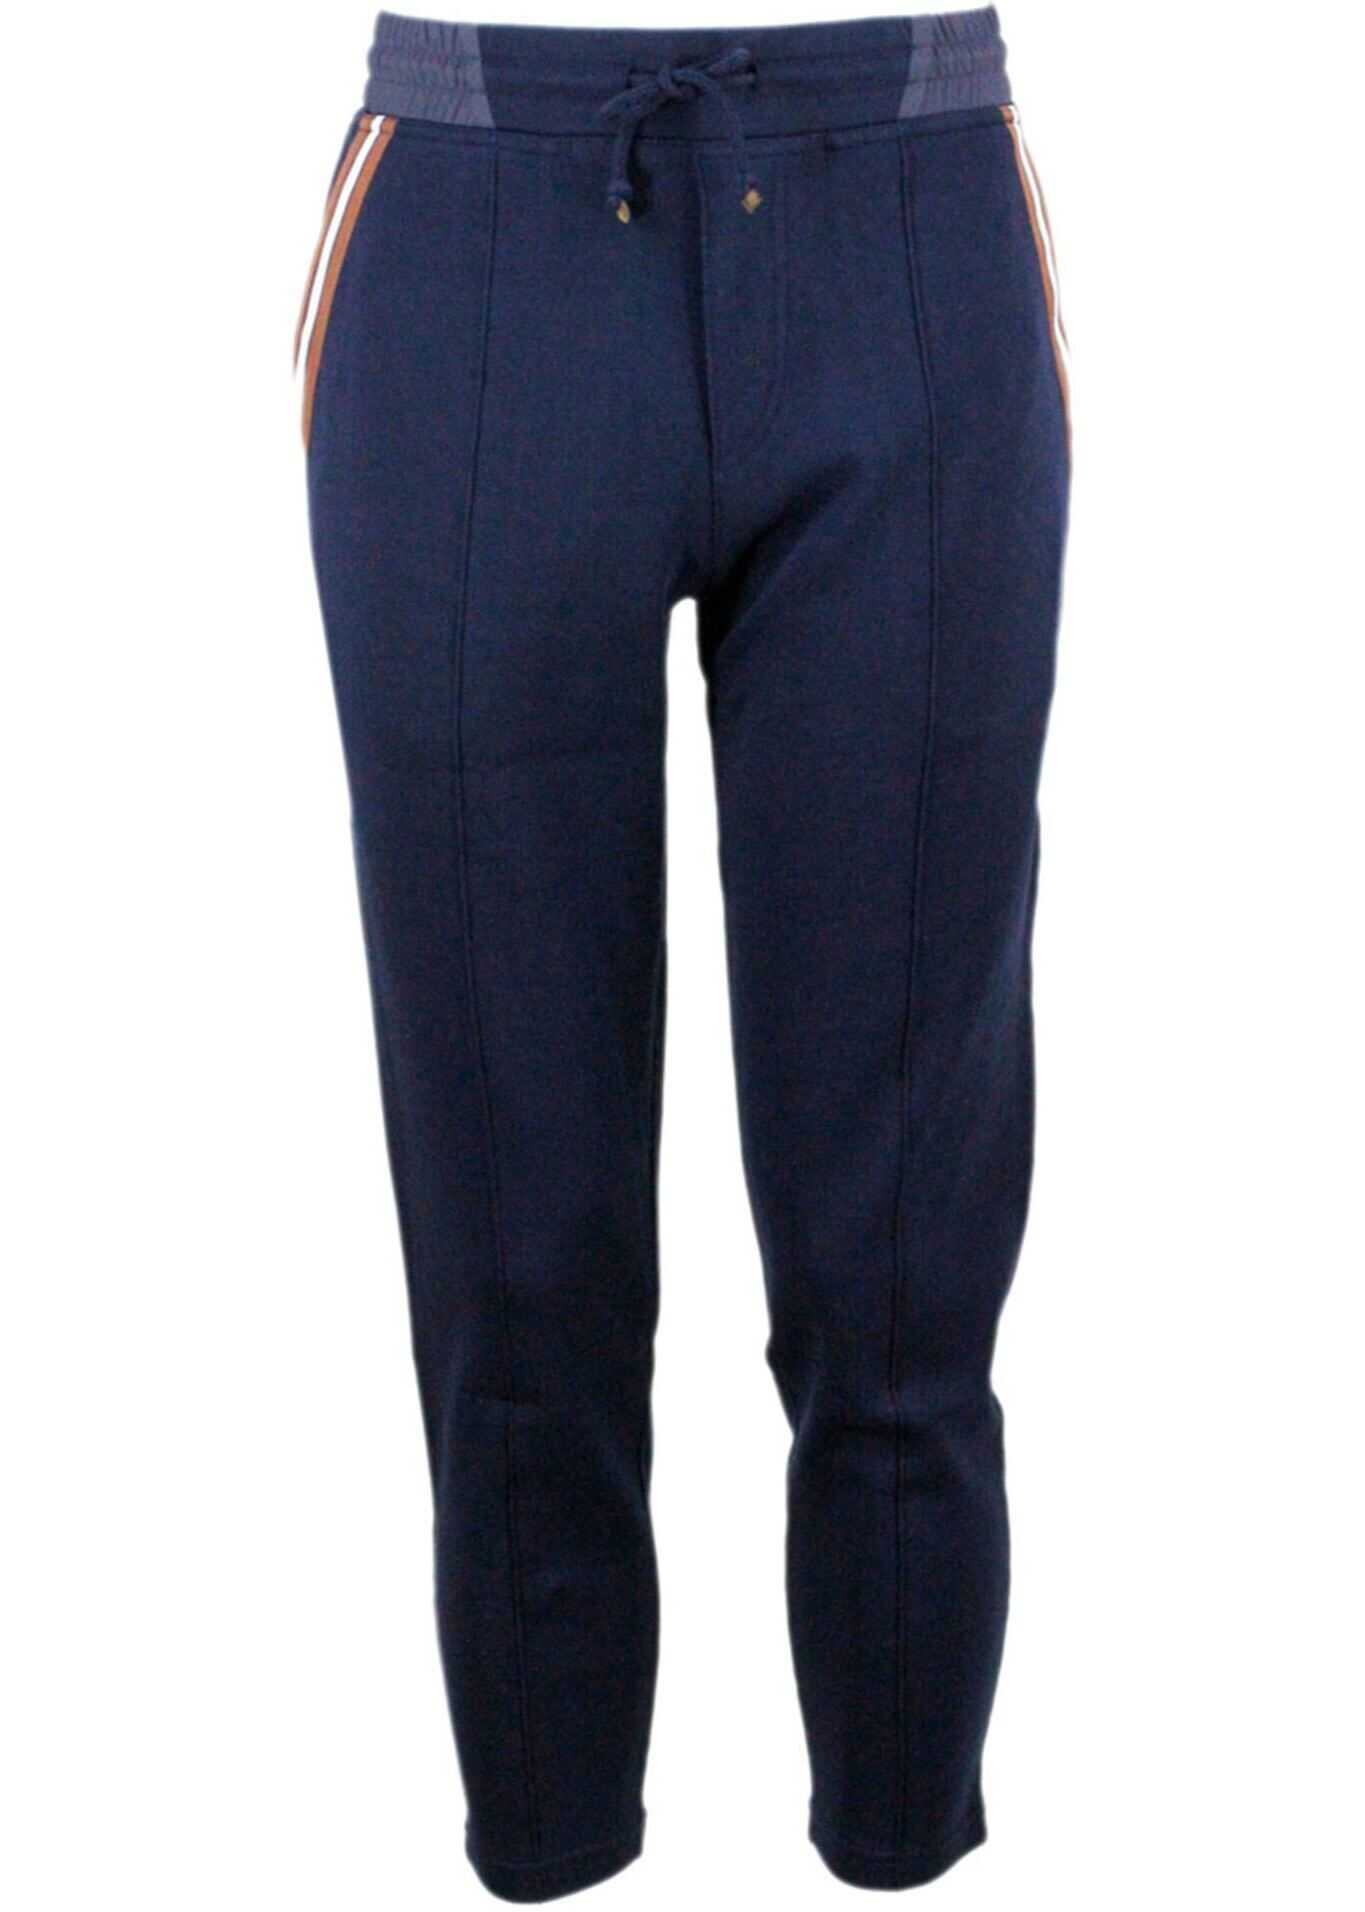 Brunello Cucinelli Joggers Striped Insert Pants In Blue Blue imagine